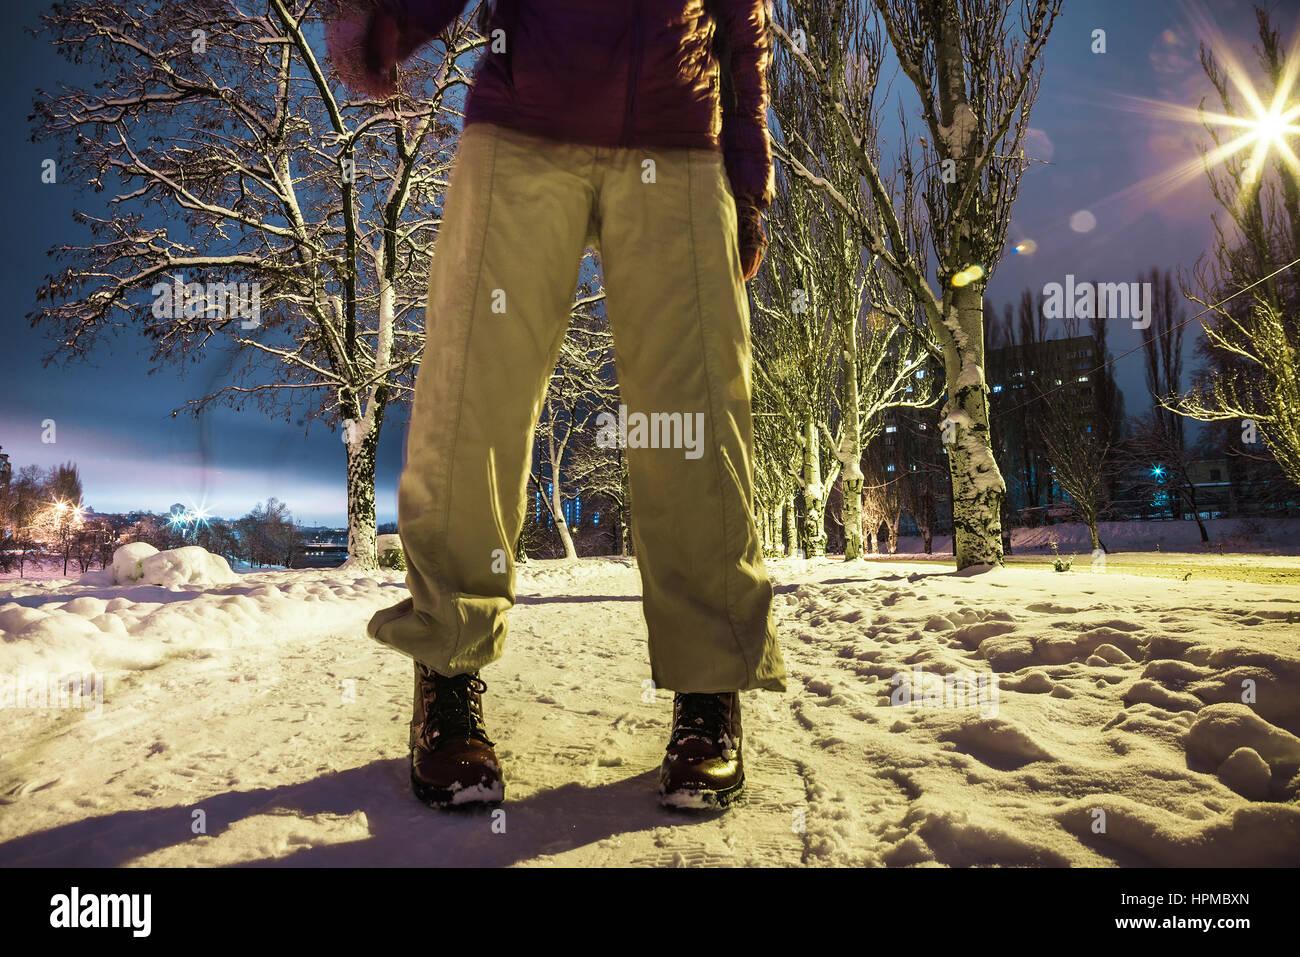 Human feet standing snowy road night street lamps - Stock Image